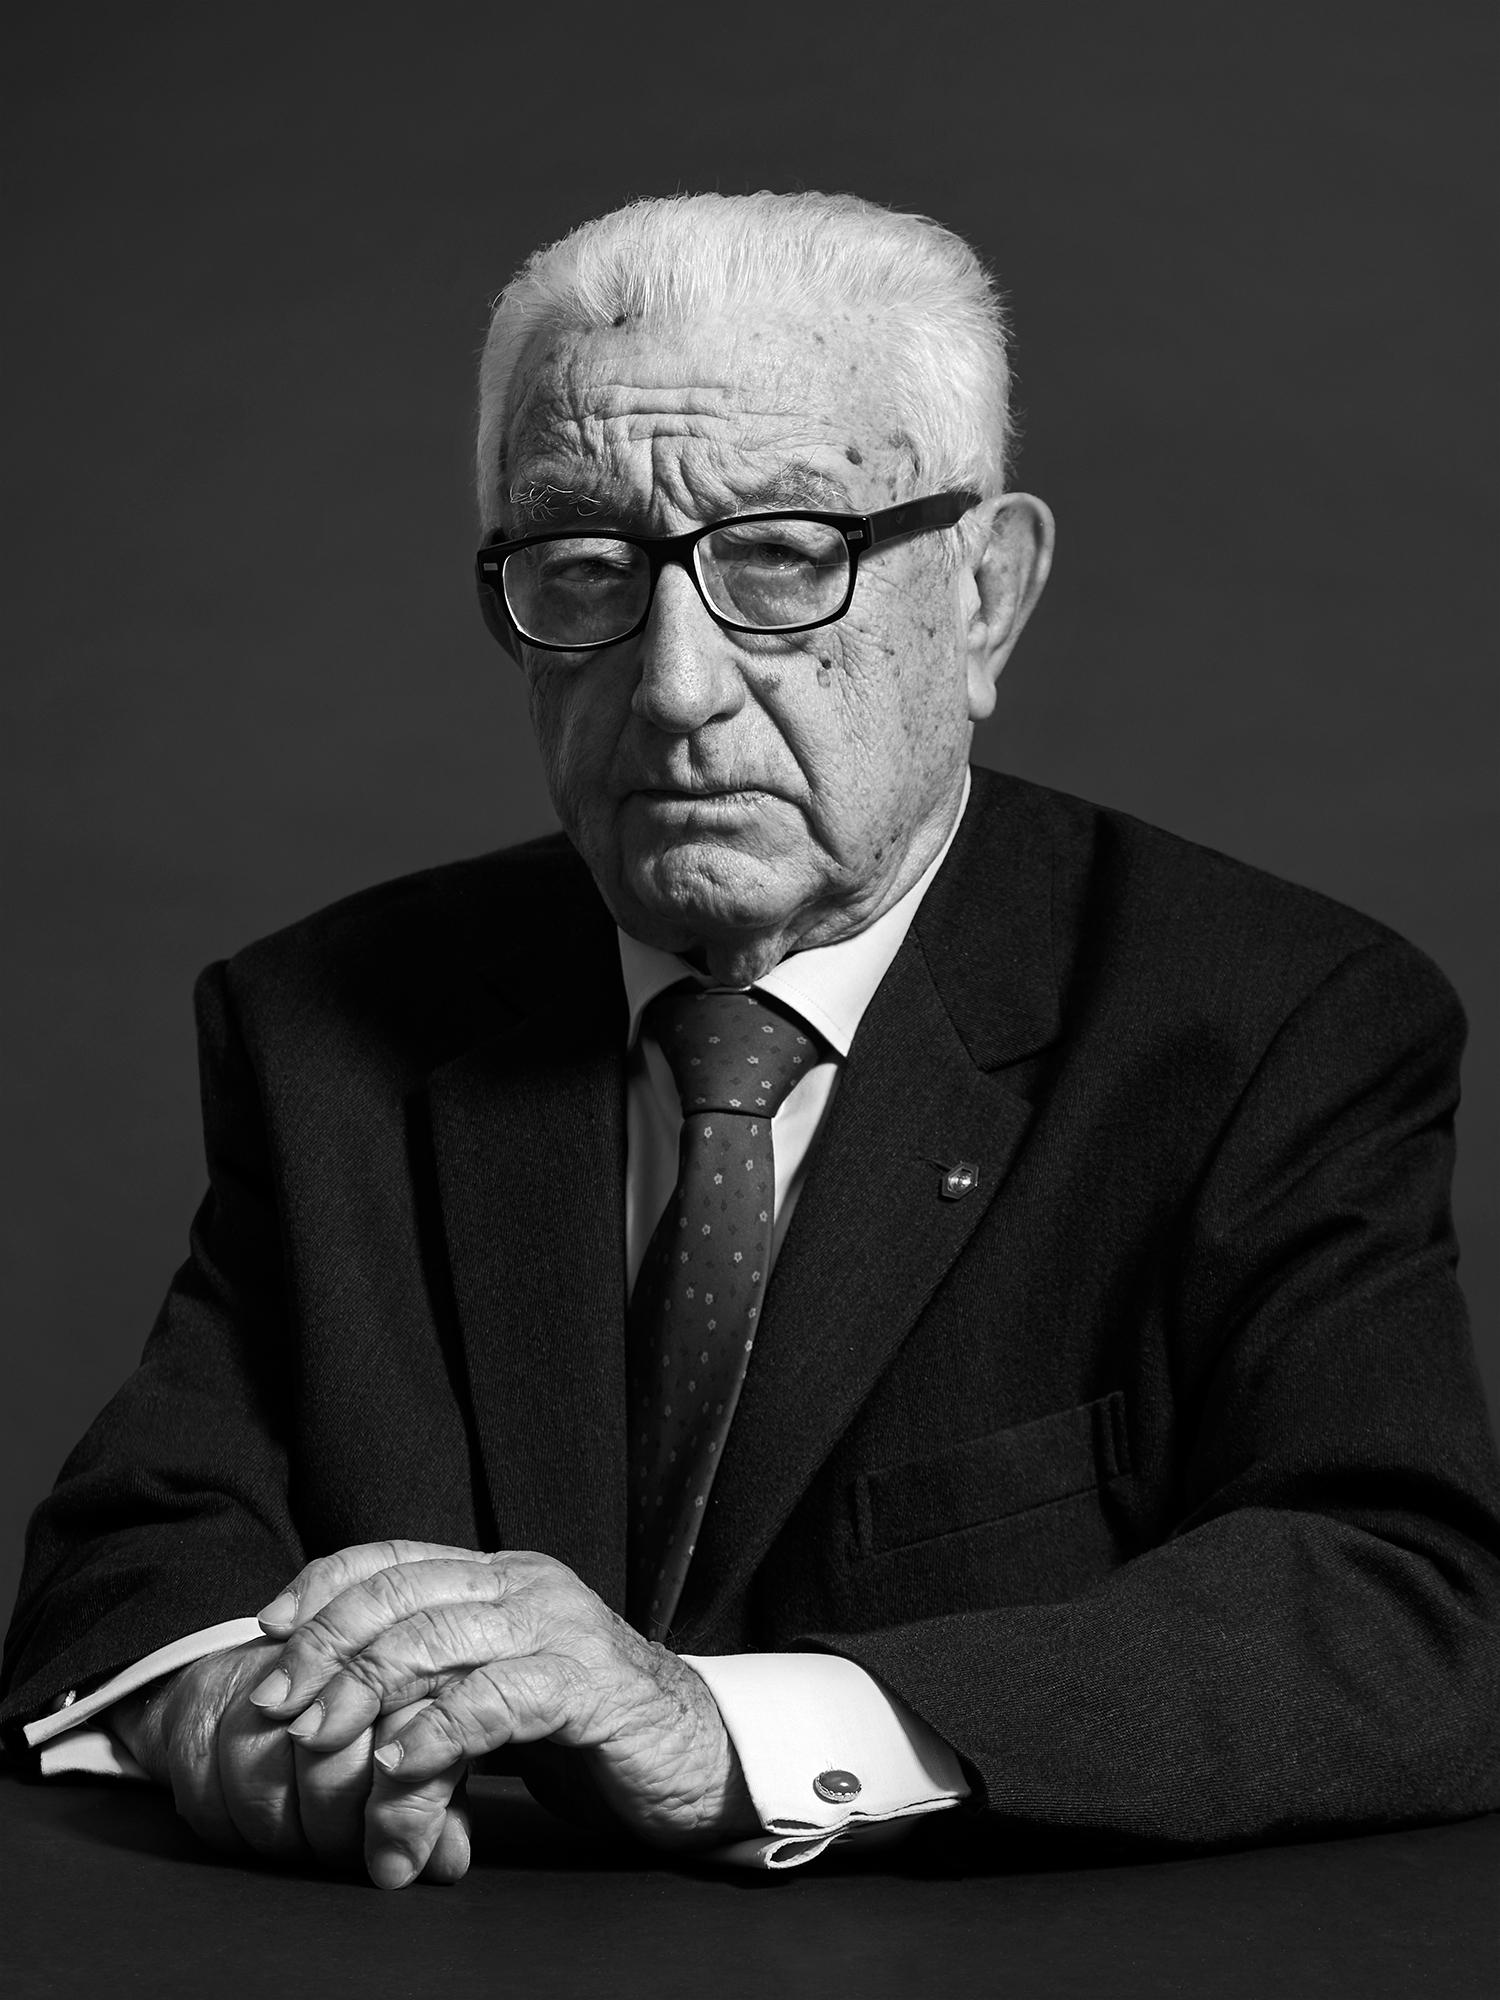 Riccardo Lamanna, Glasford International Italy